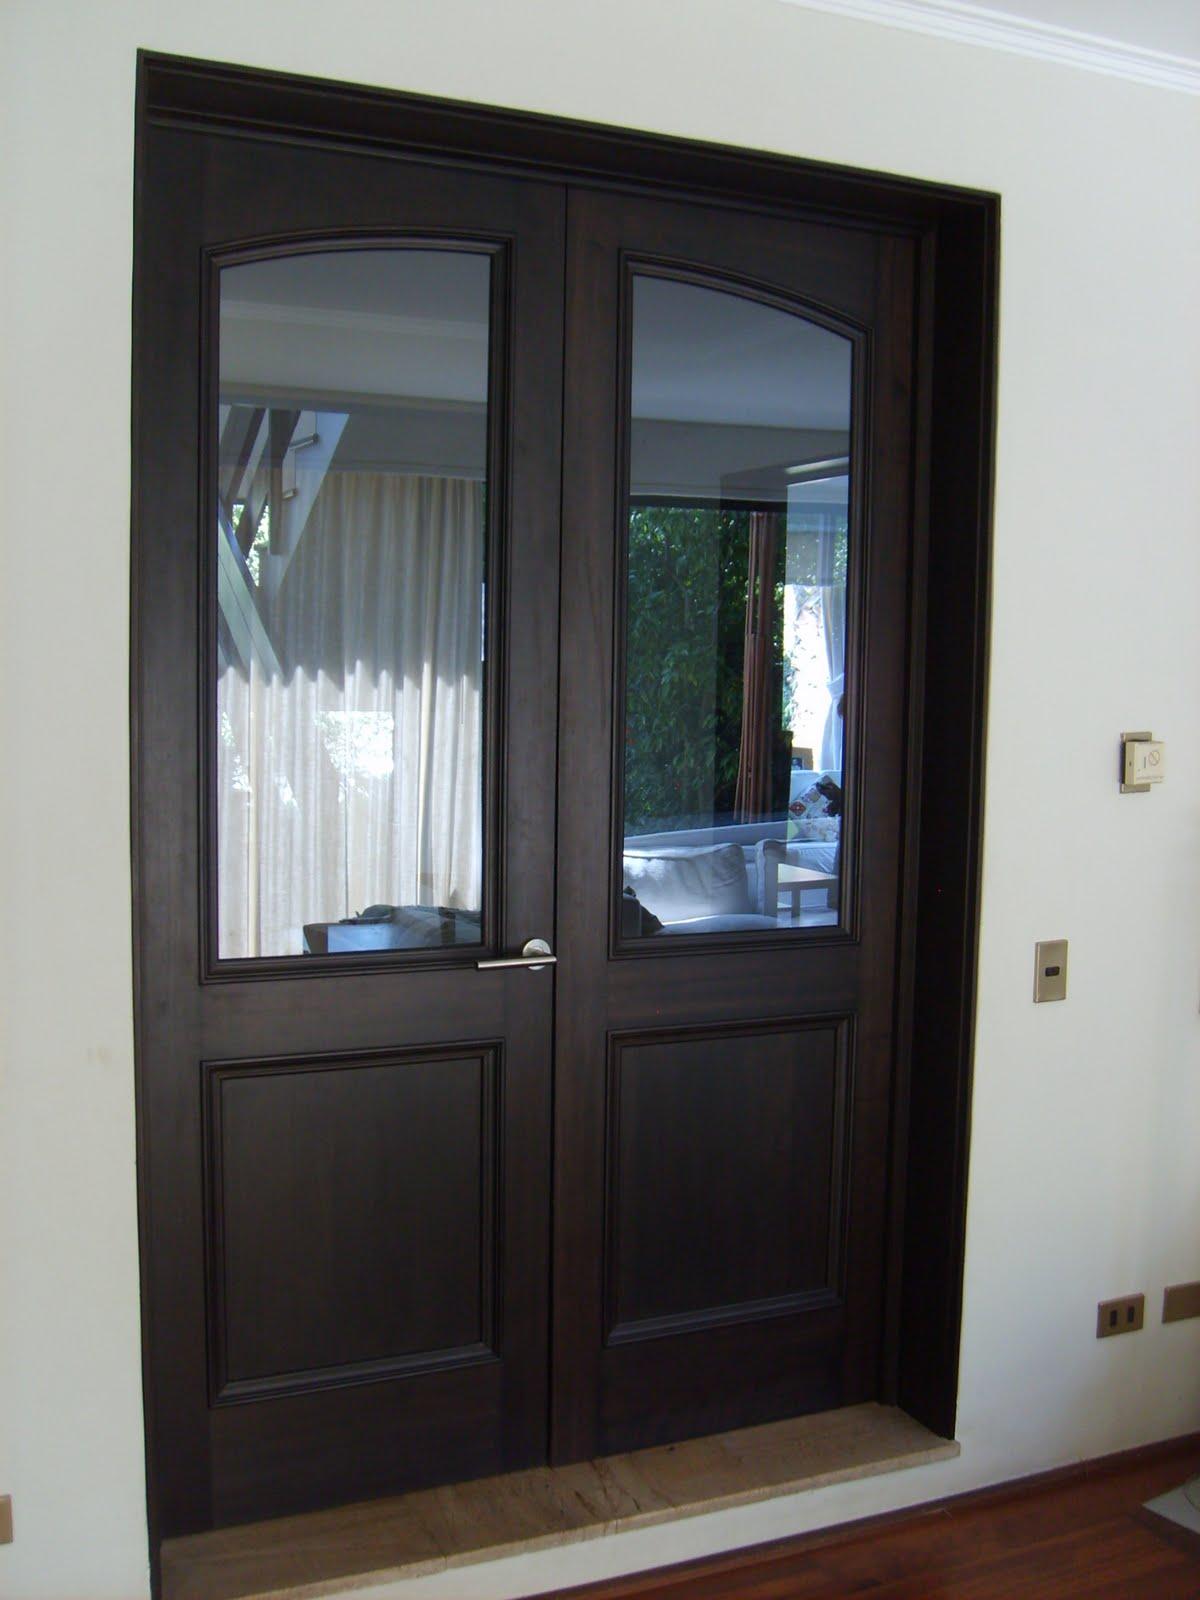 Muebles andrea schoennenbeck puerta de madera - Barnizar puertas de madera ...